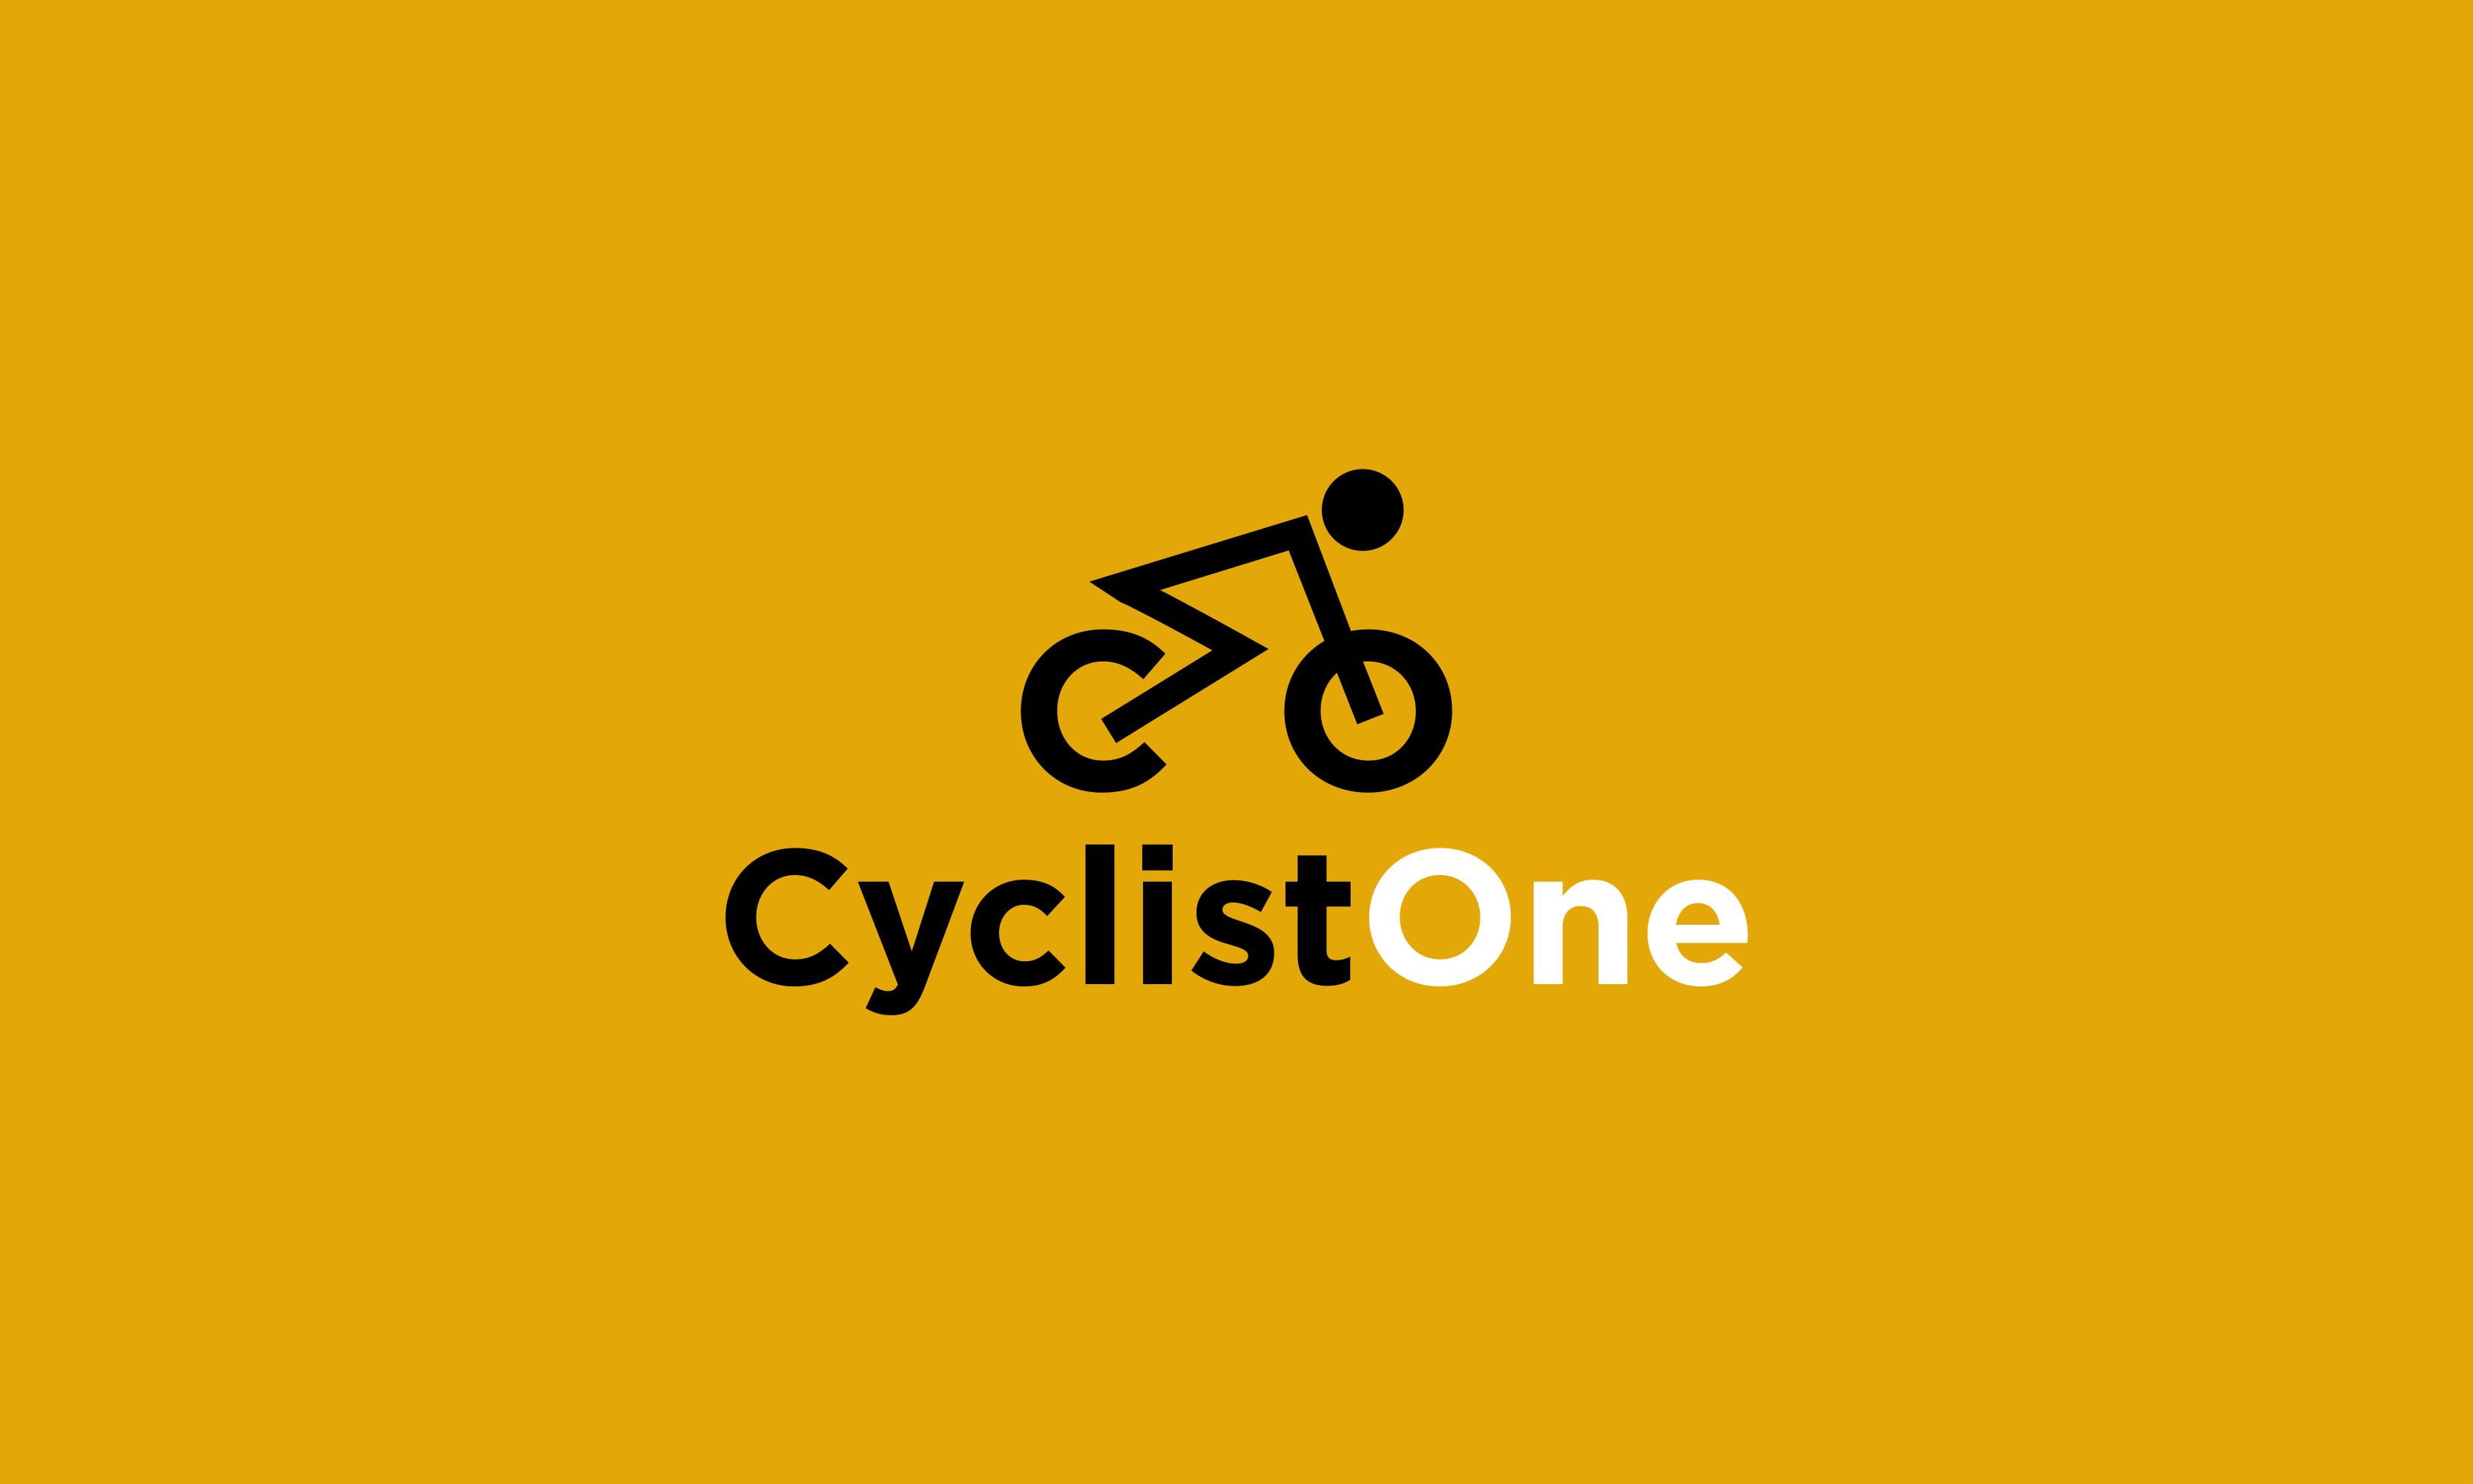 Cyclistone